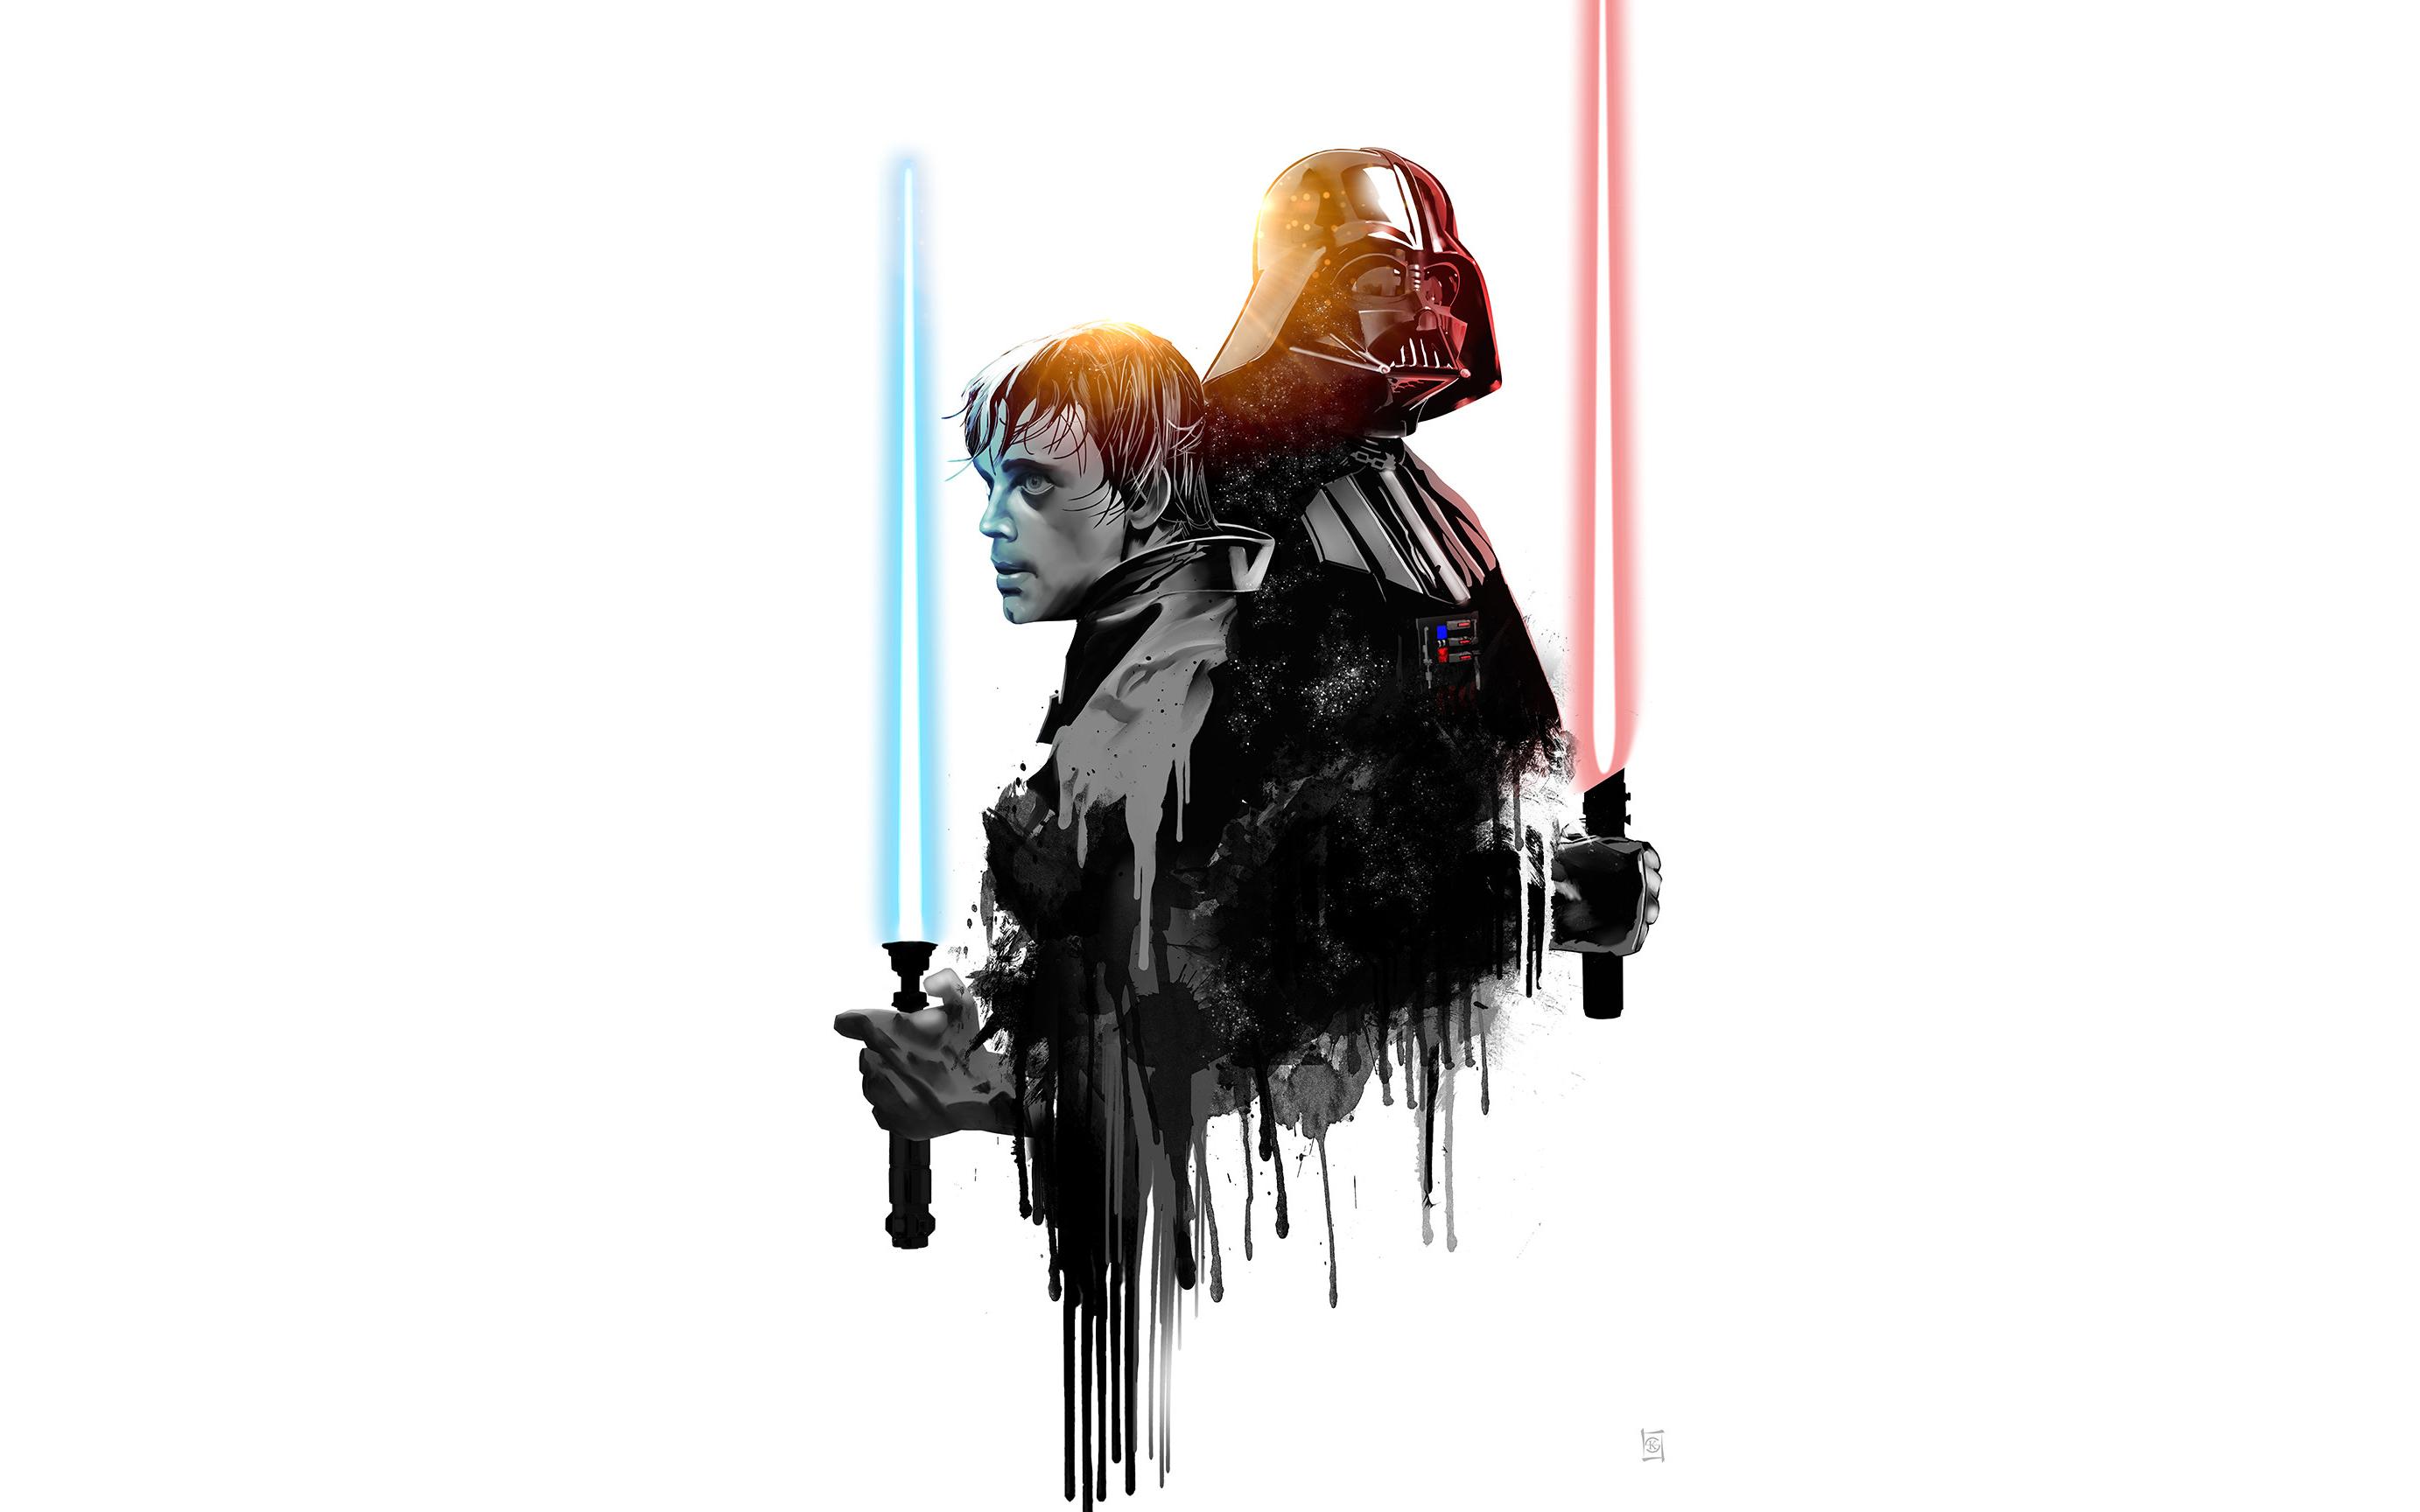 Minimalist Lightsaber Darth Vader Luke Skywalker 2765x1728